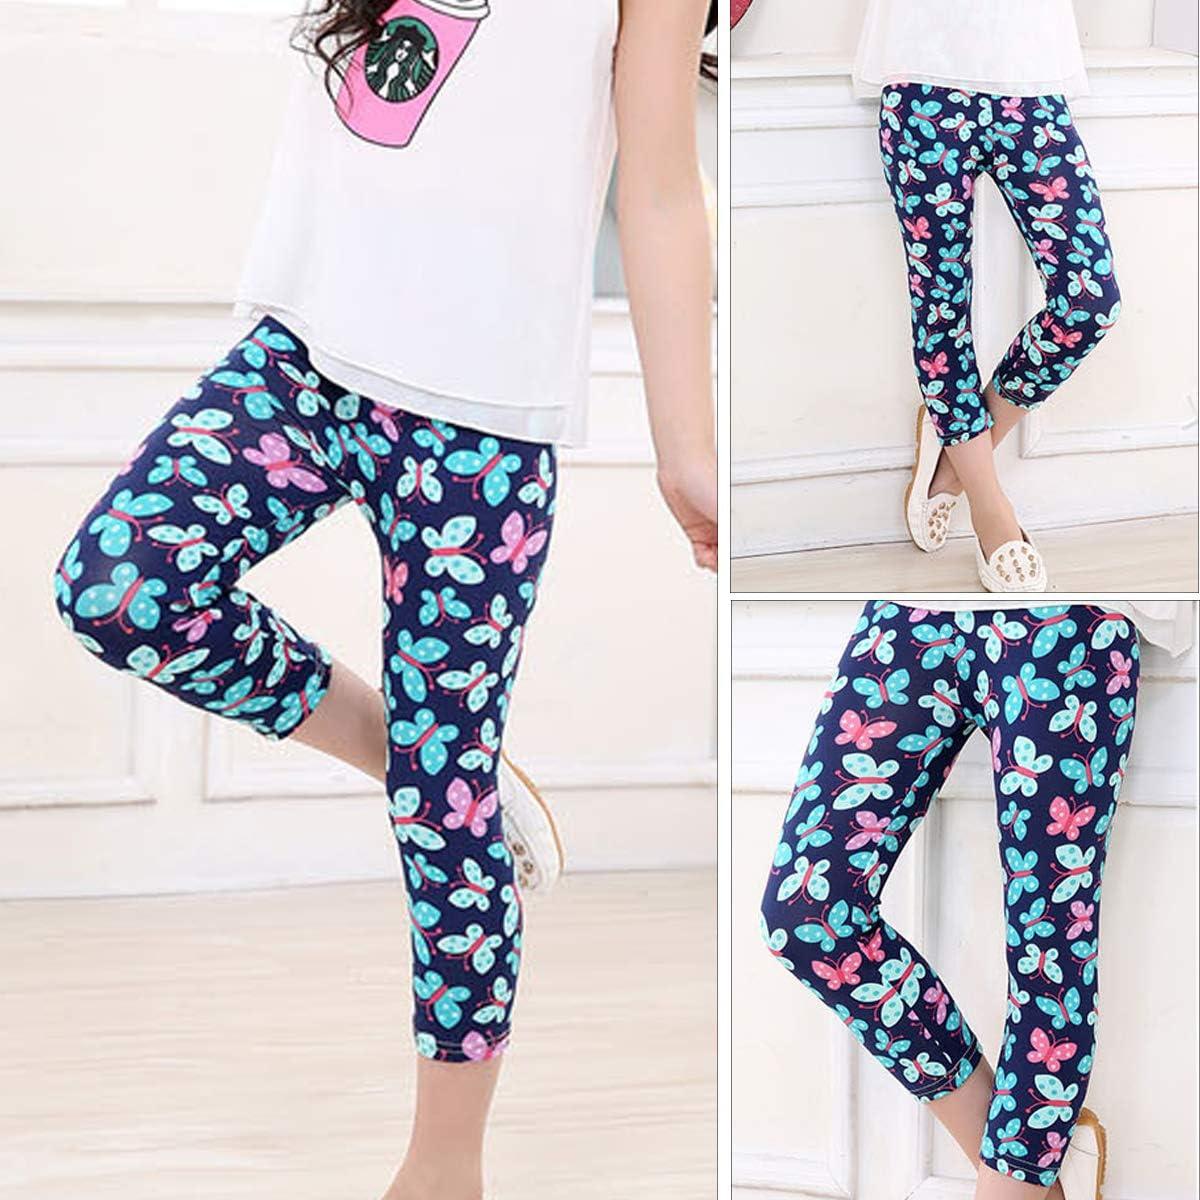 2-3 Pcs Kids Girls Leggings Children Stretch Floral Pattern Pants Tights Age 4-13 Years